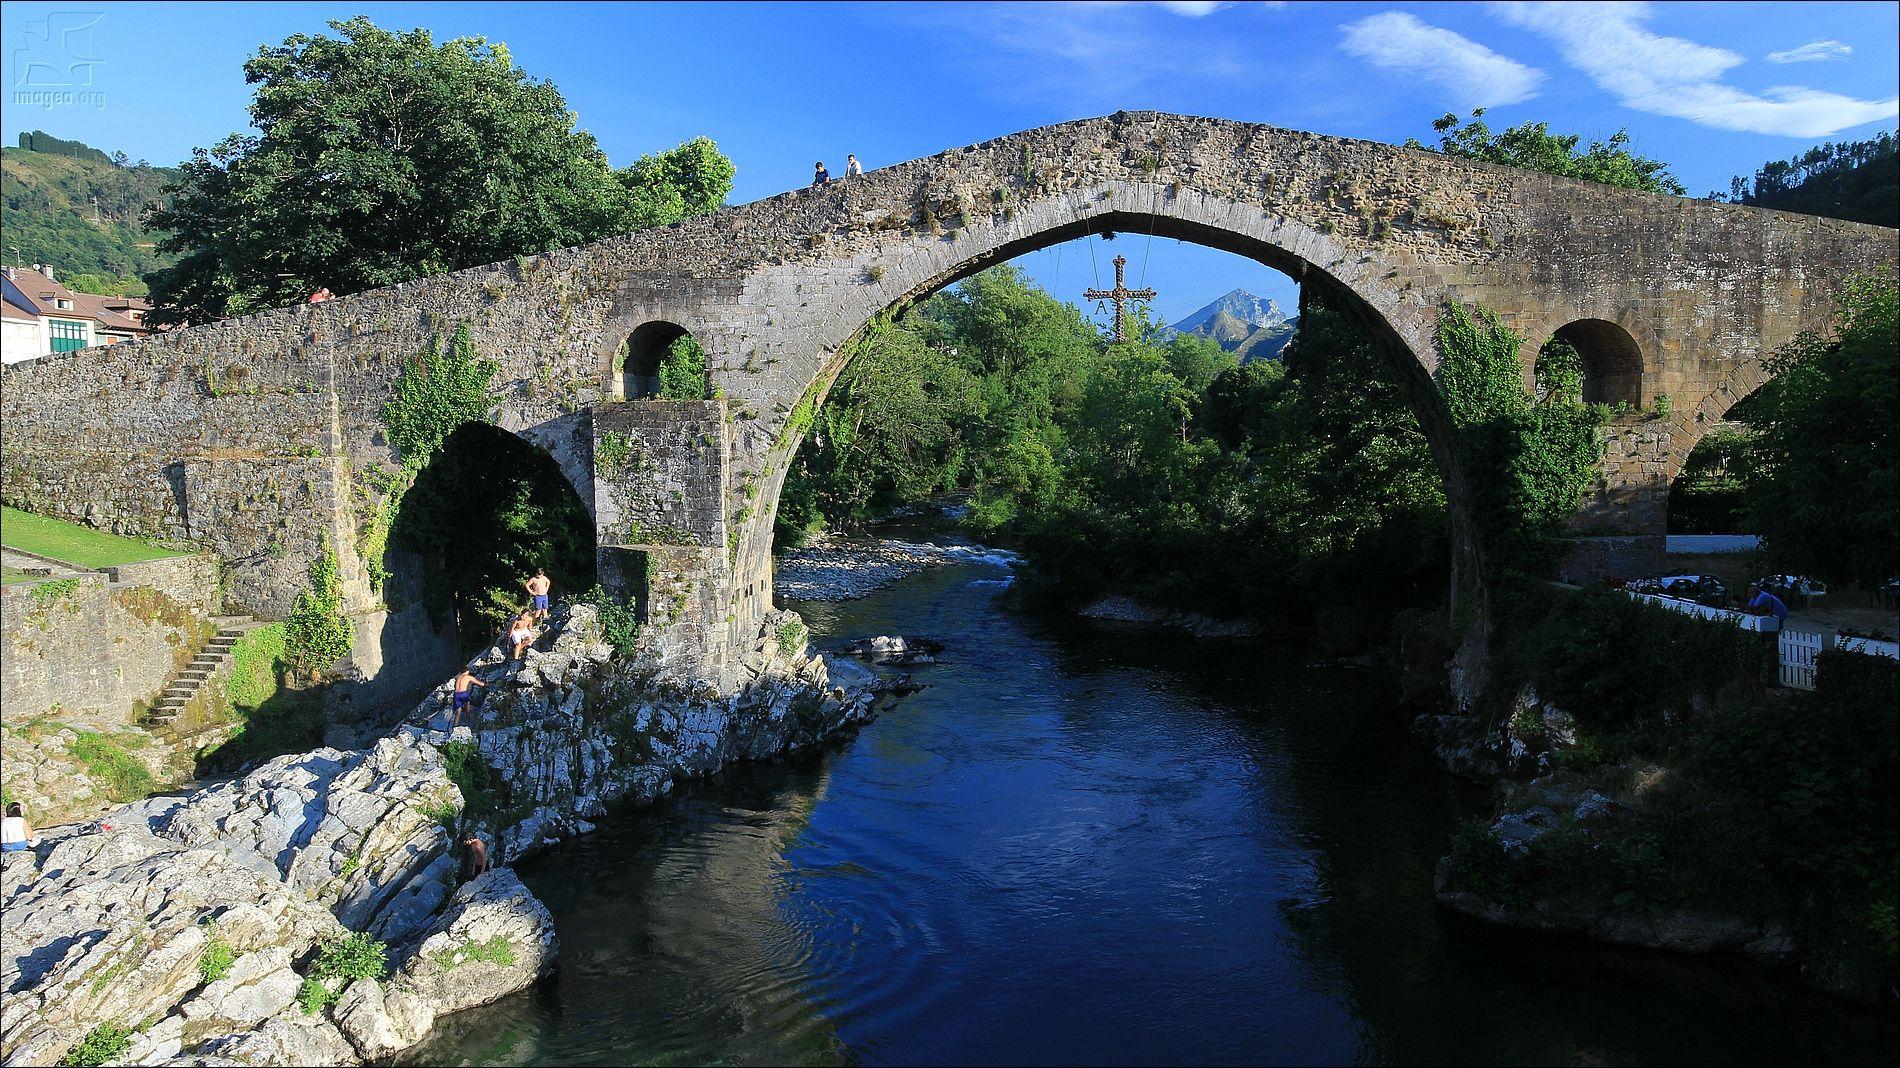 Cangas de Onís Roman bridge - Cangas de Onís Roman bridge - Asturias - Spain